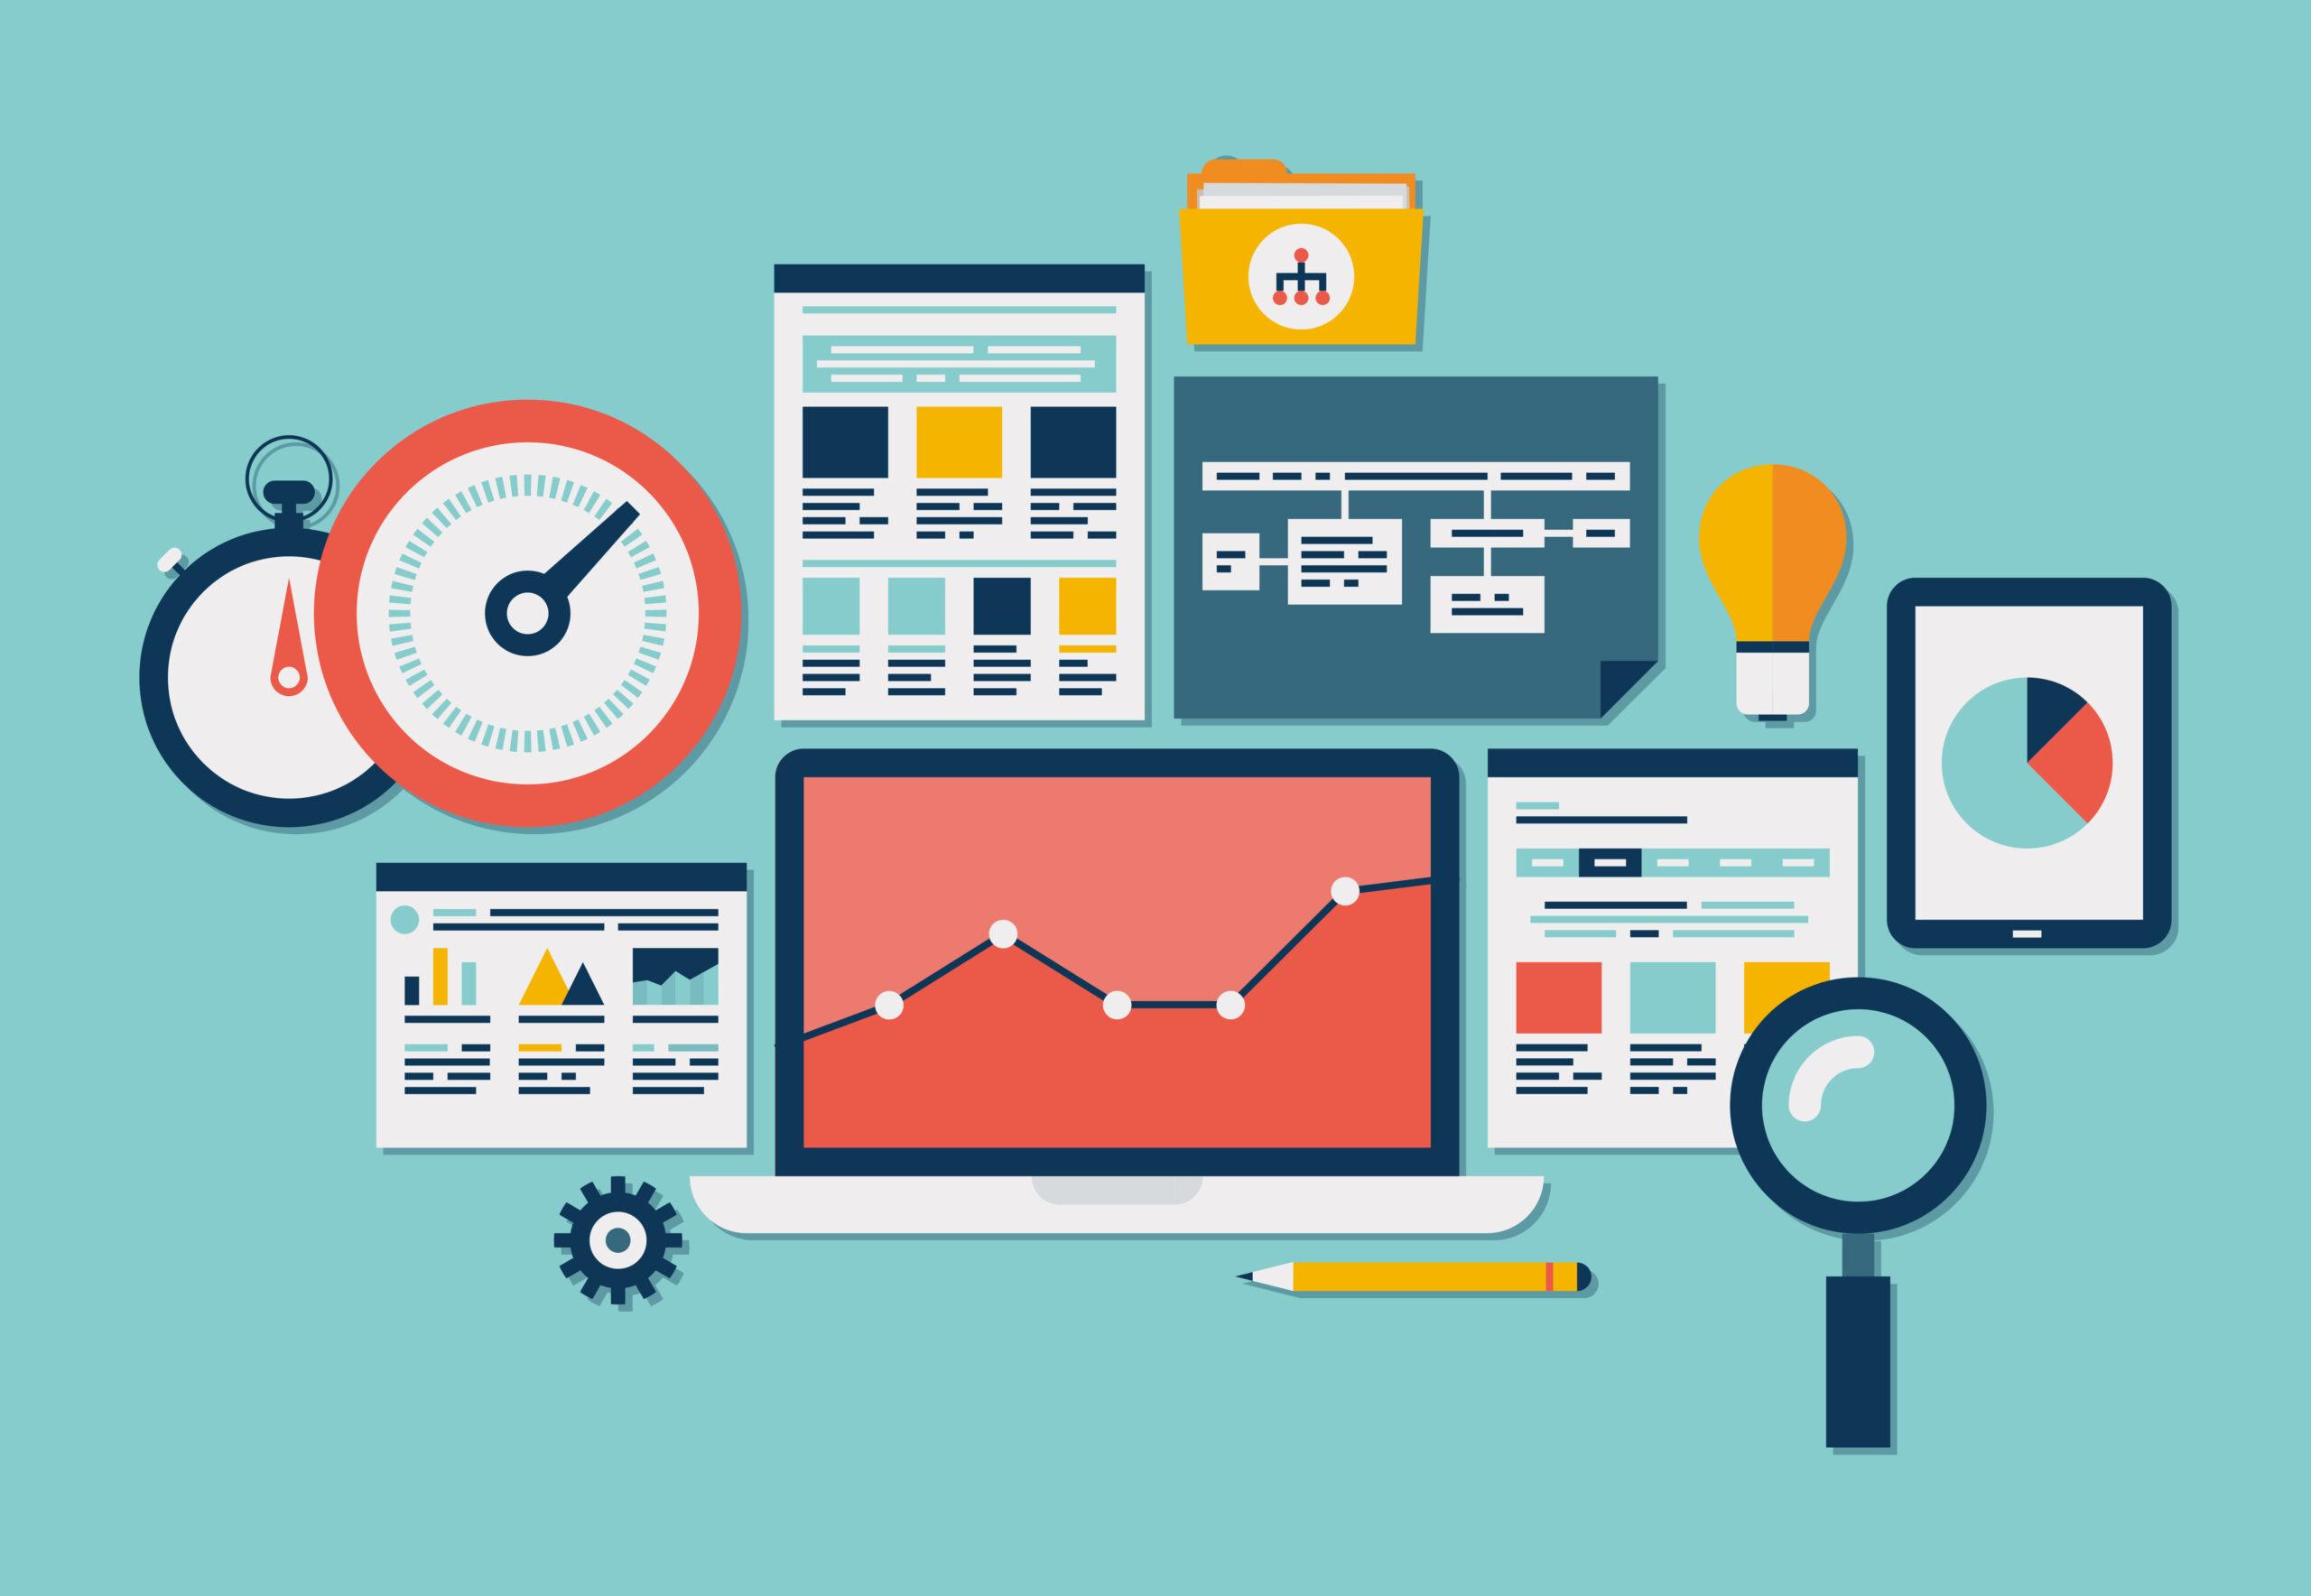 Blogpost visualization, the power of data in marketing